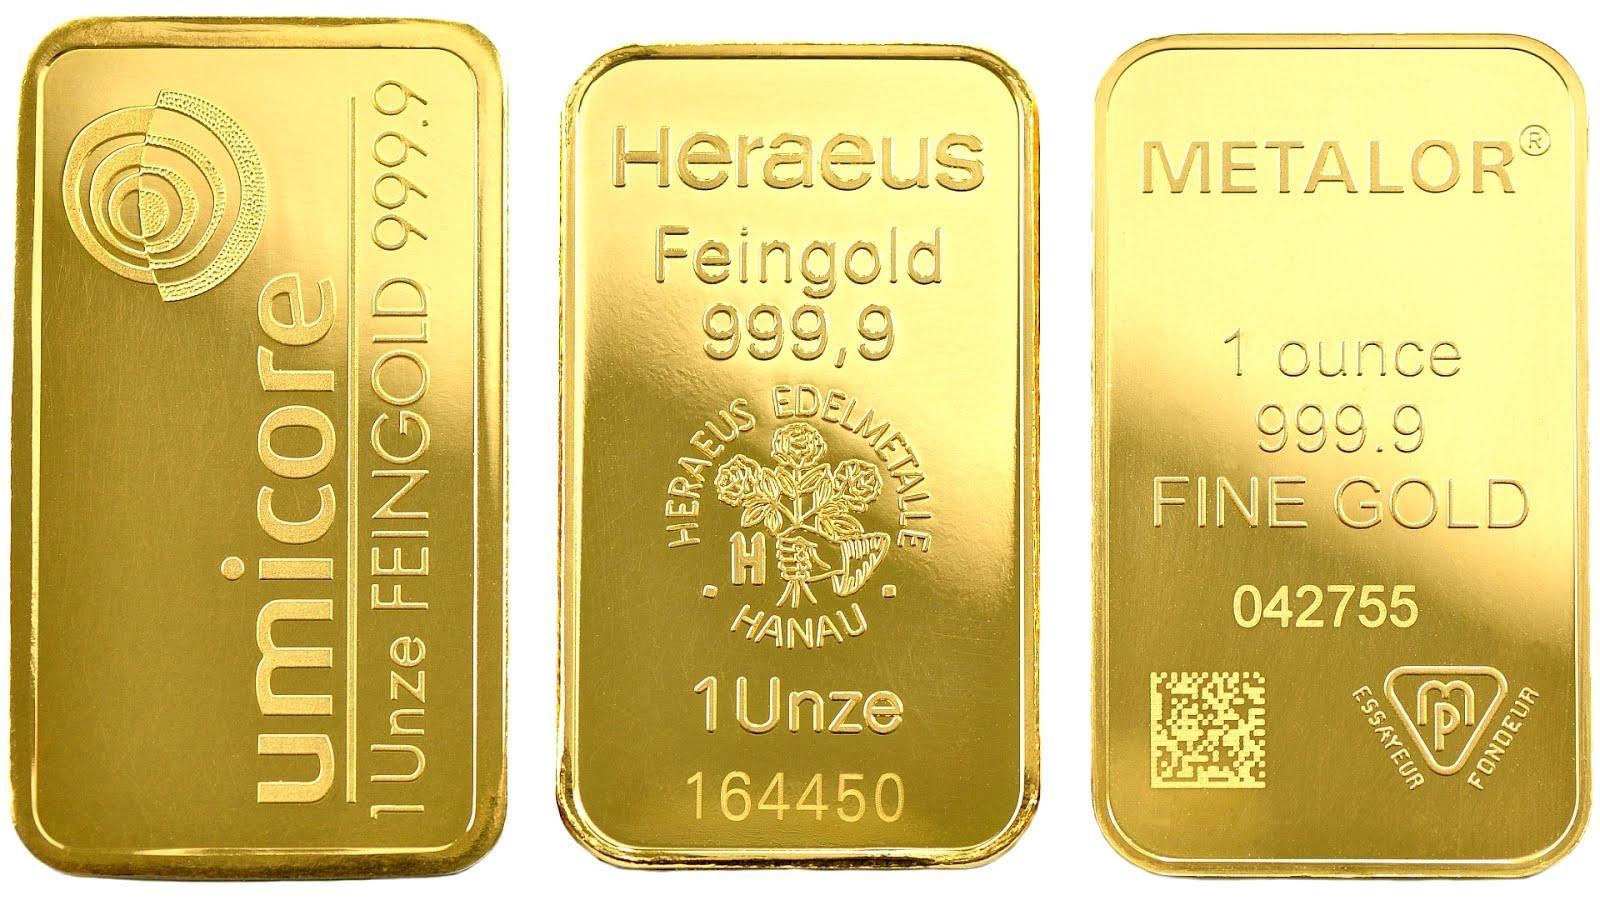 10 Tola Gold Bar Price Choices